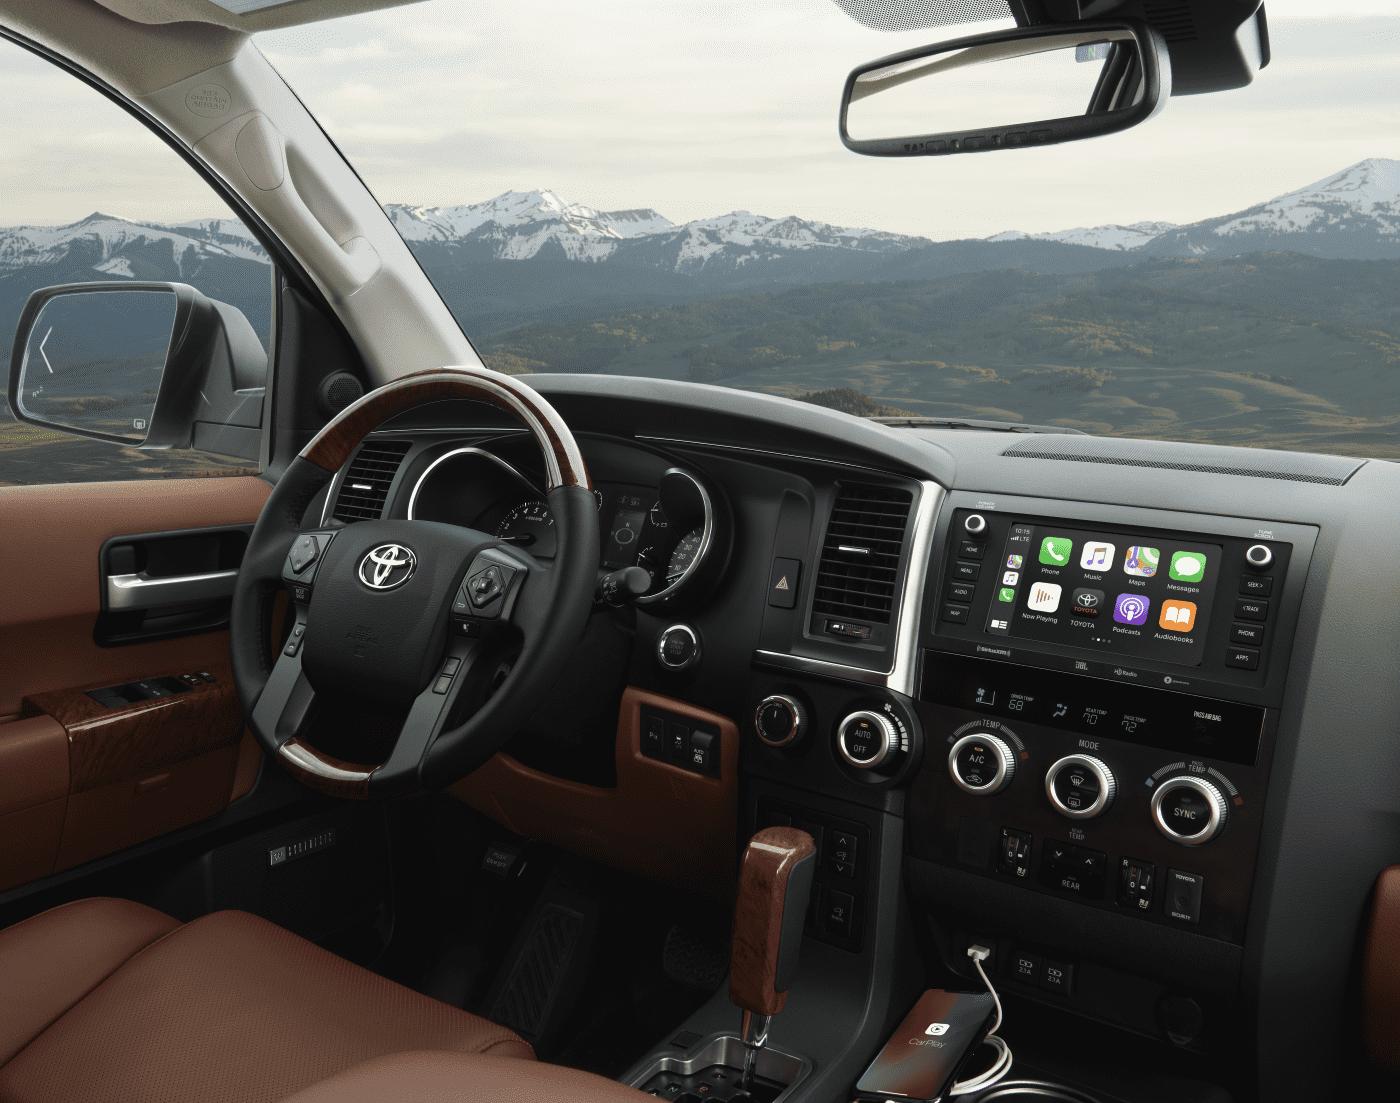 2021 Toyota Sequoia Dashboard